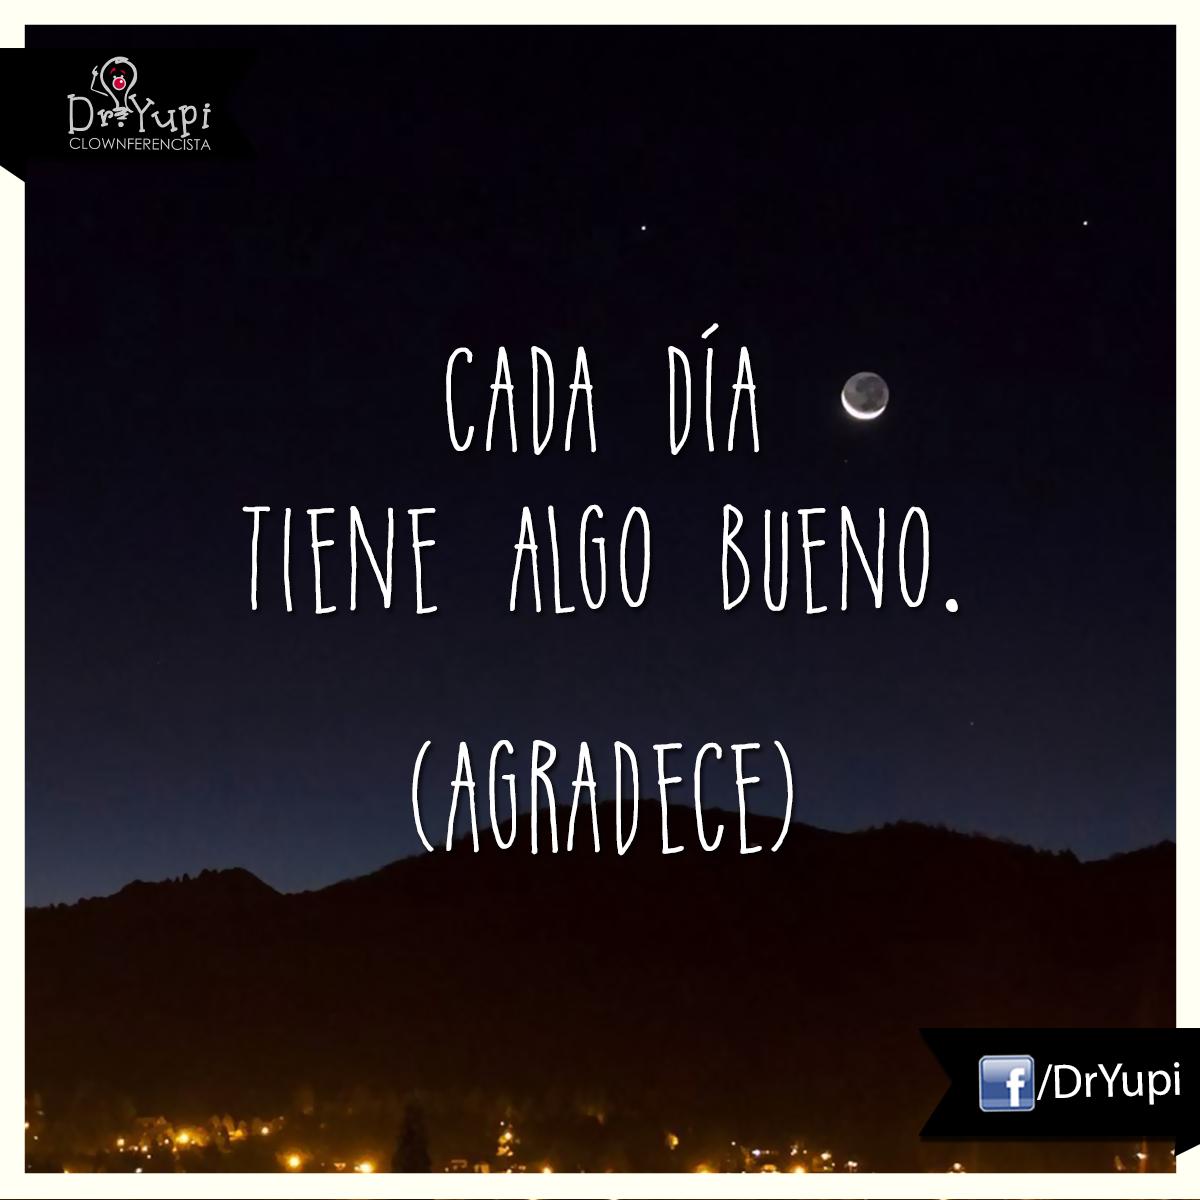 Frases Noche Agradecer Frases Reflexion Frases Para